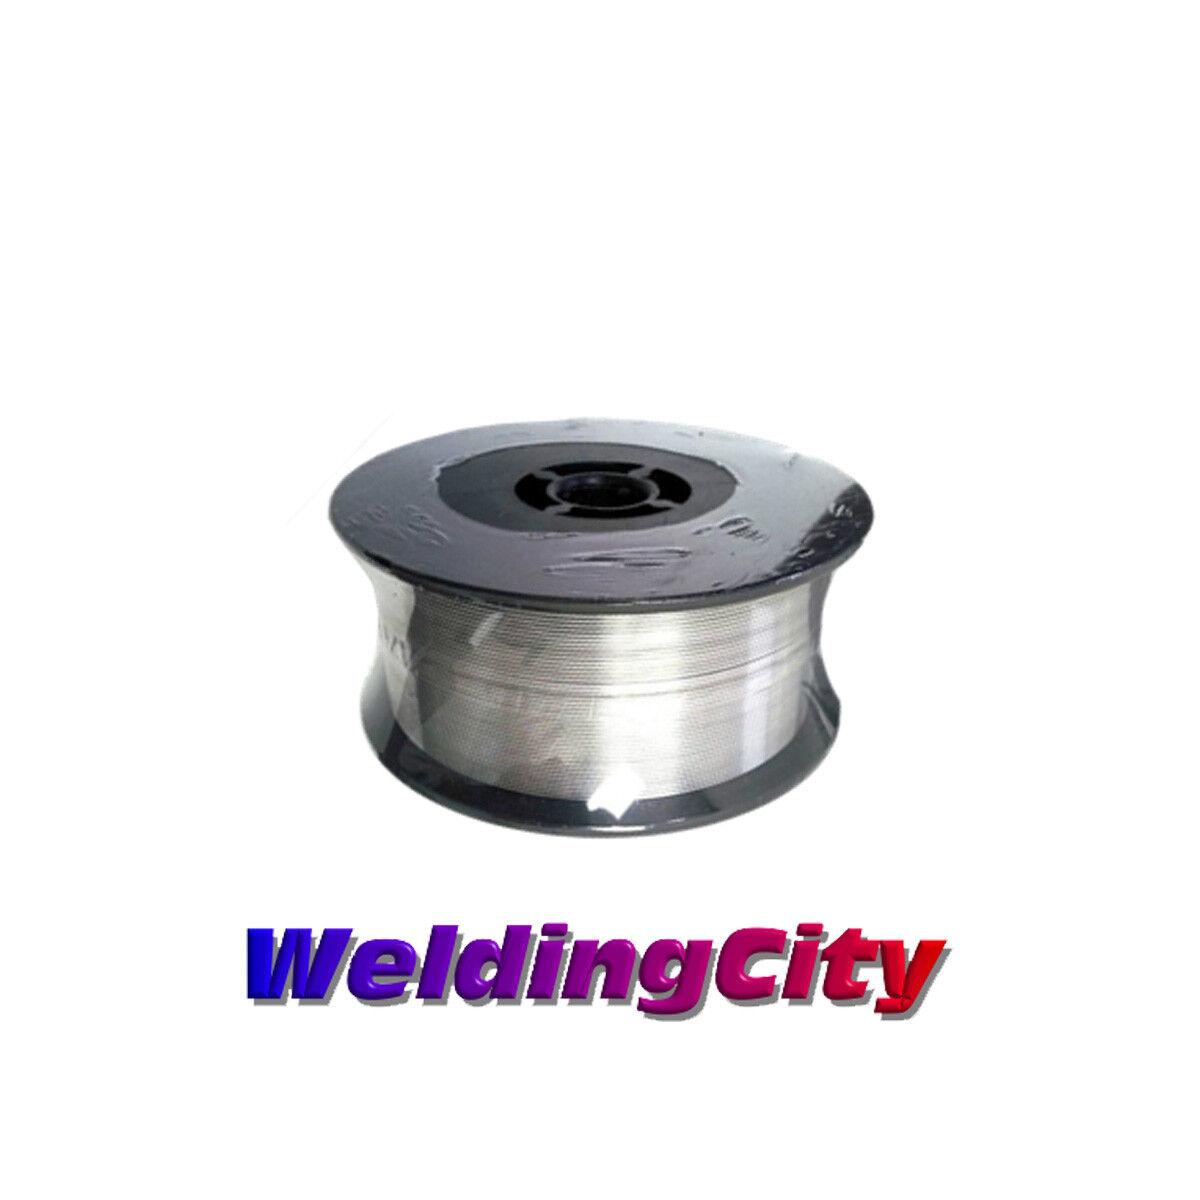 WeldingCity 2 Rolls of ER308L Stainless Steel MIG Welding Wire 2-Lb Spool 0.030 0.8mm